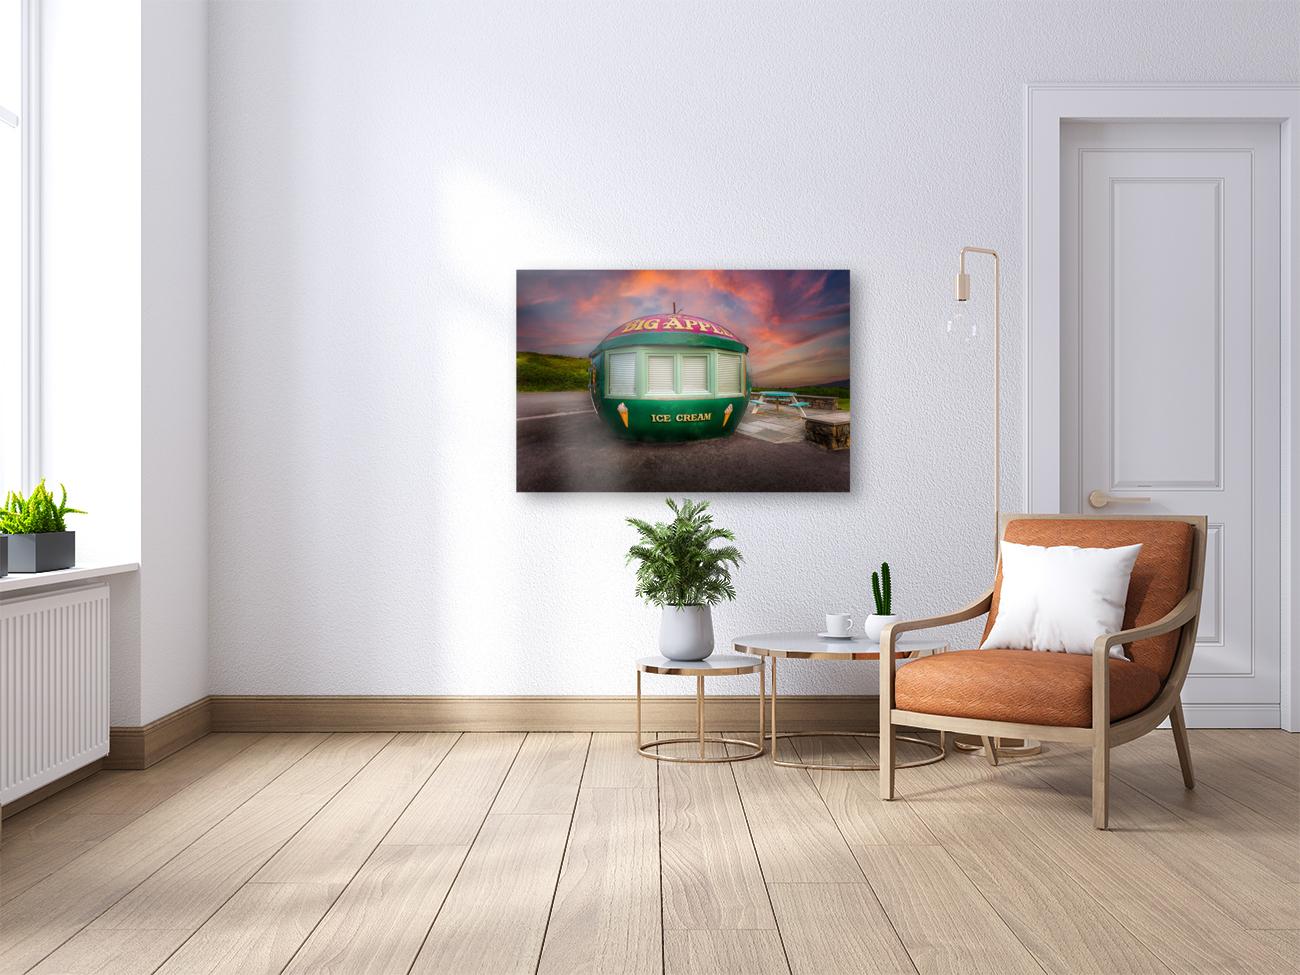 Big Apple Kiosk in Mumbles  Art